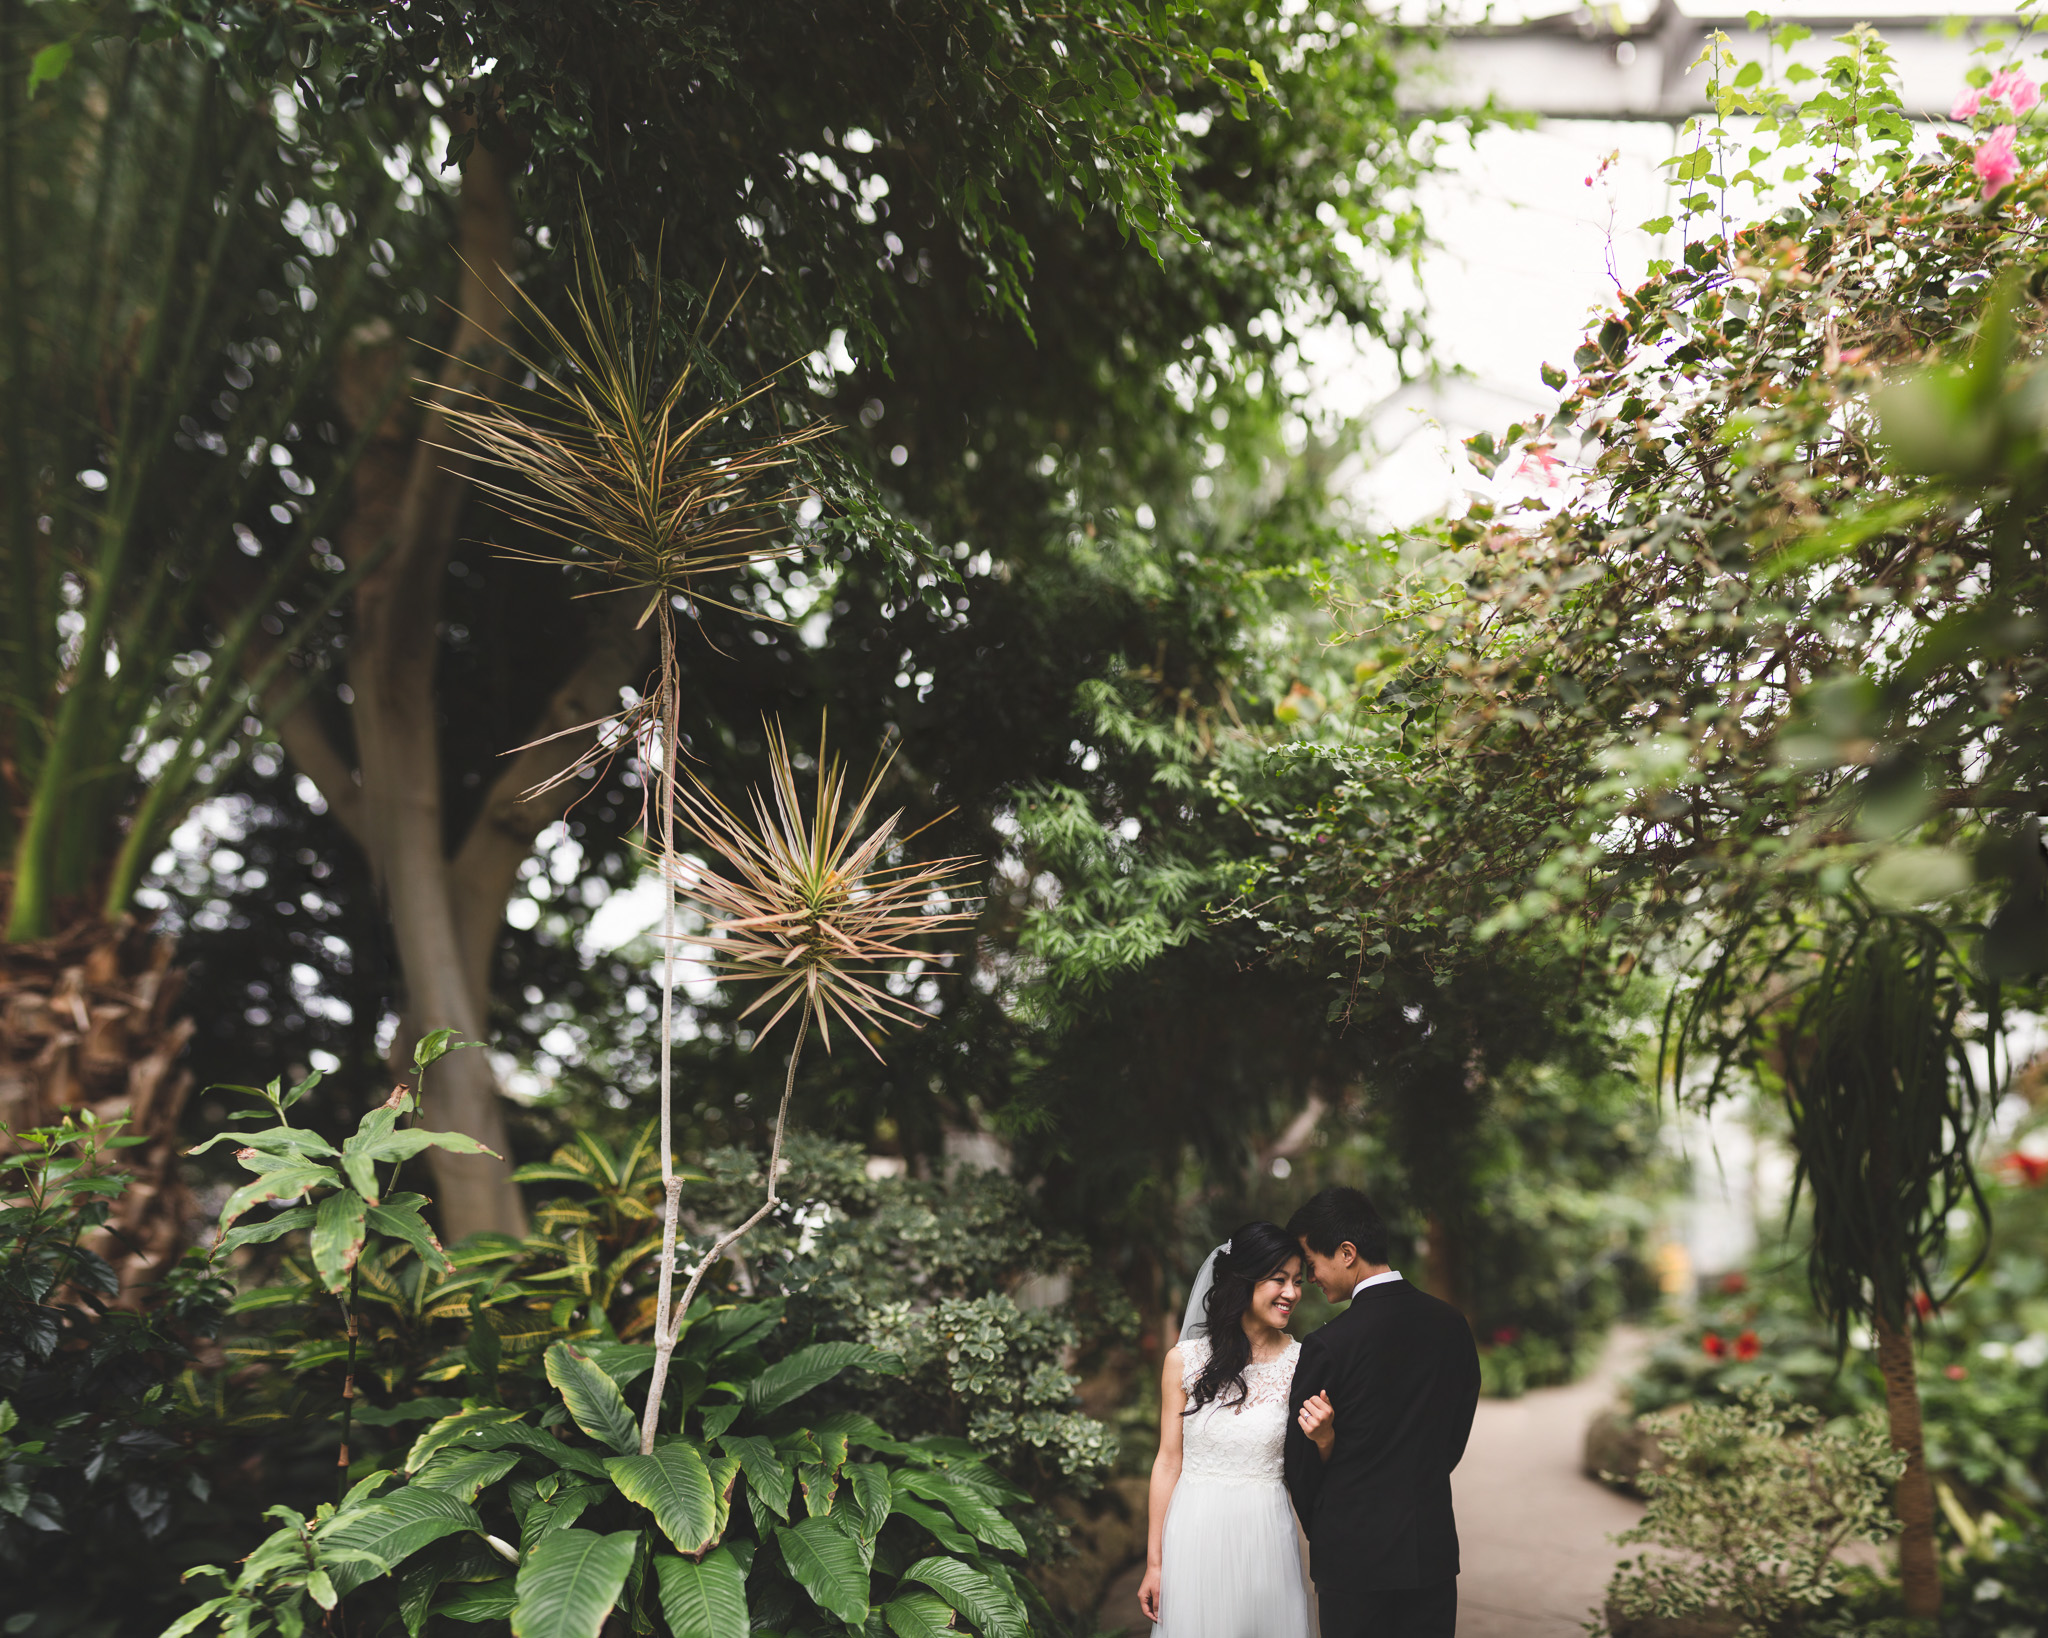 Brenizer-portrait-epic-wedding-photos-Toronto